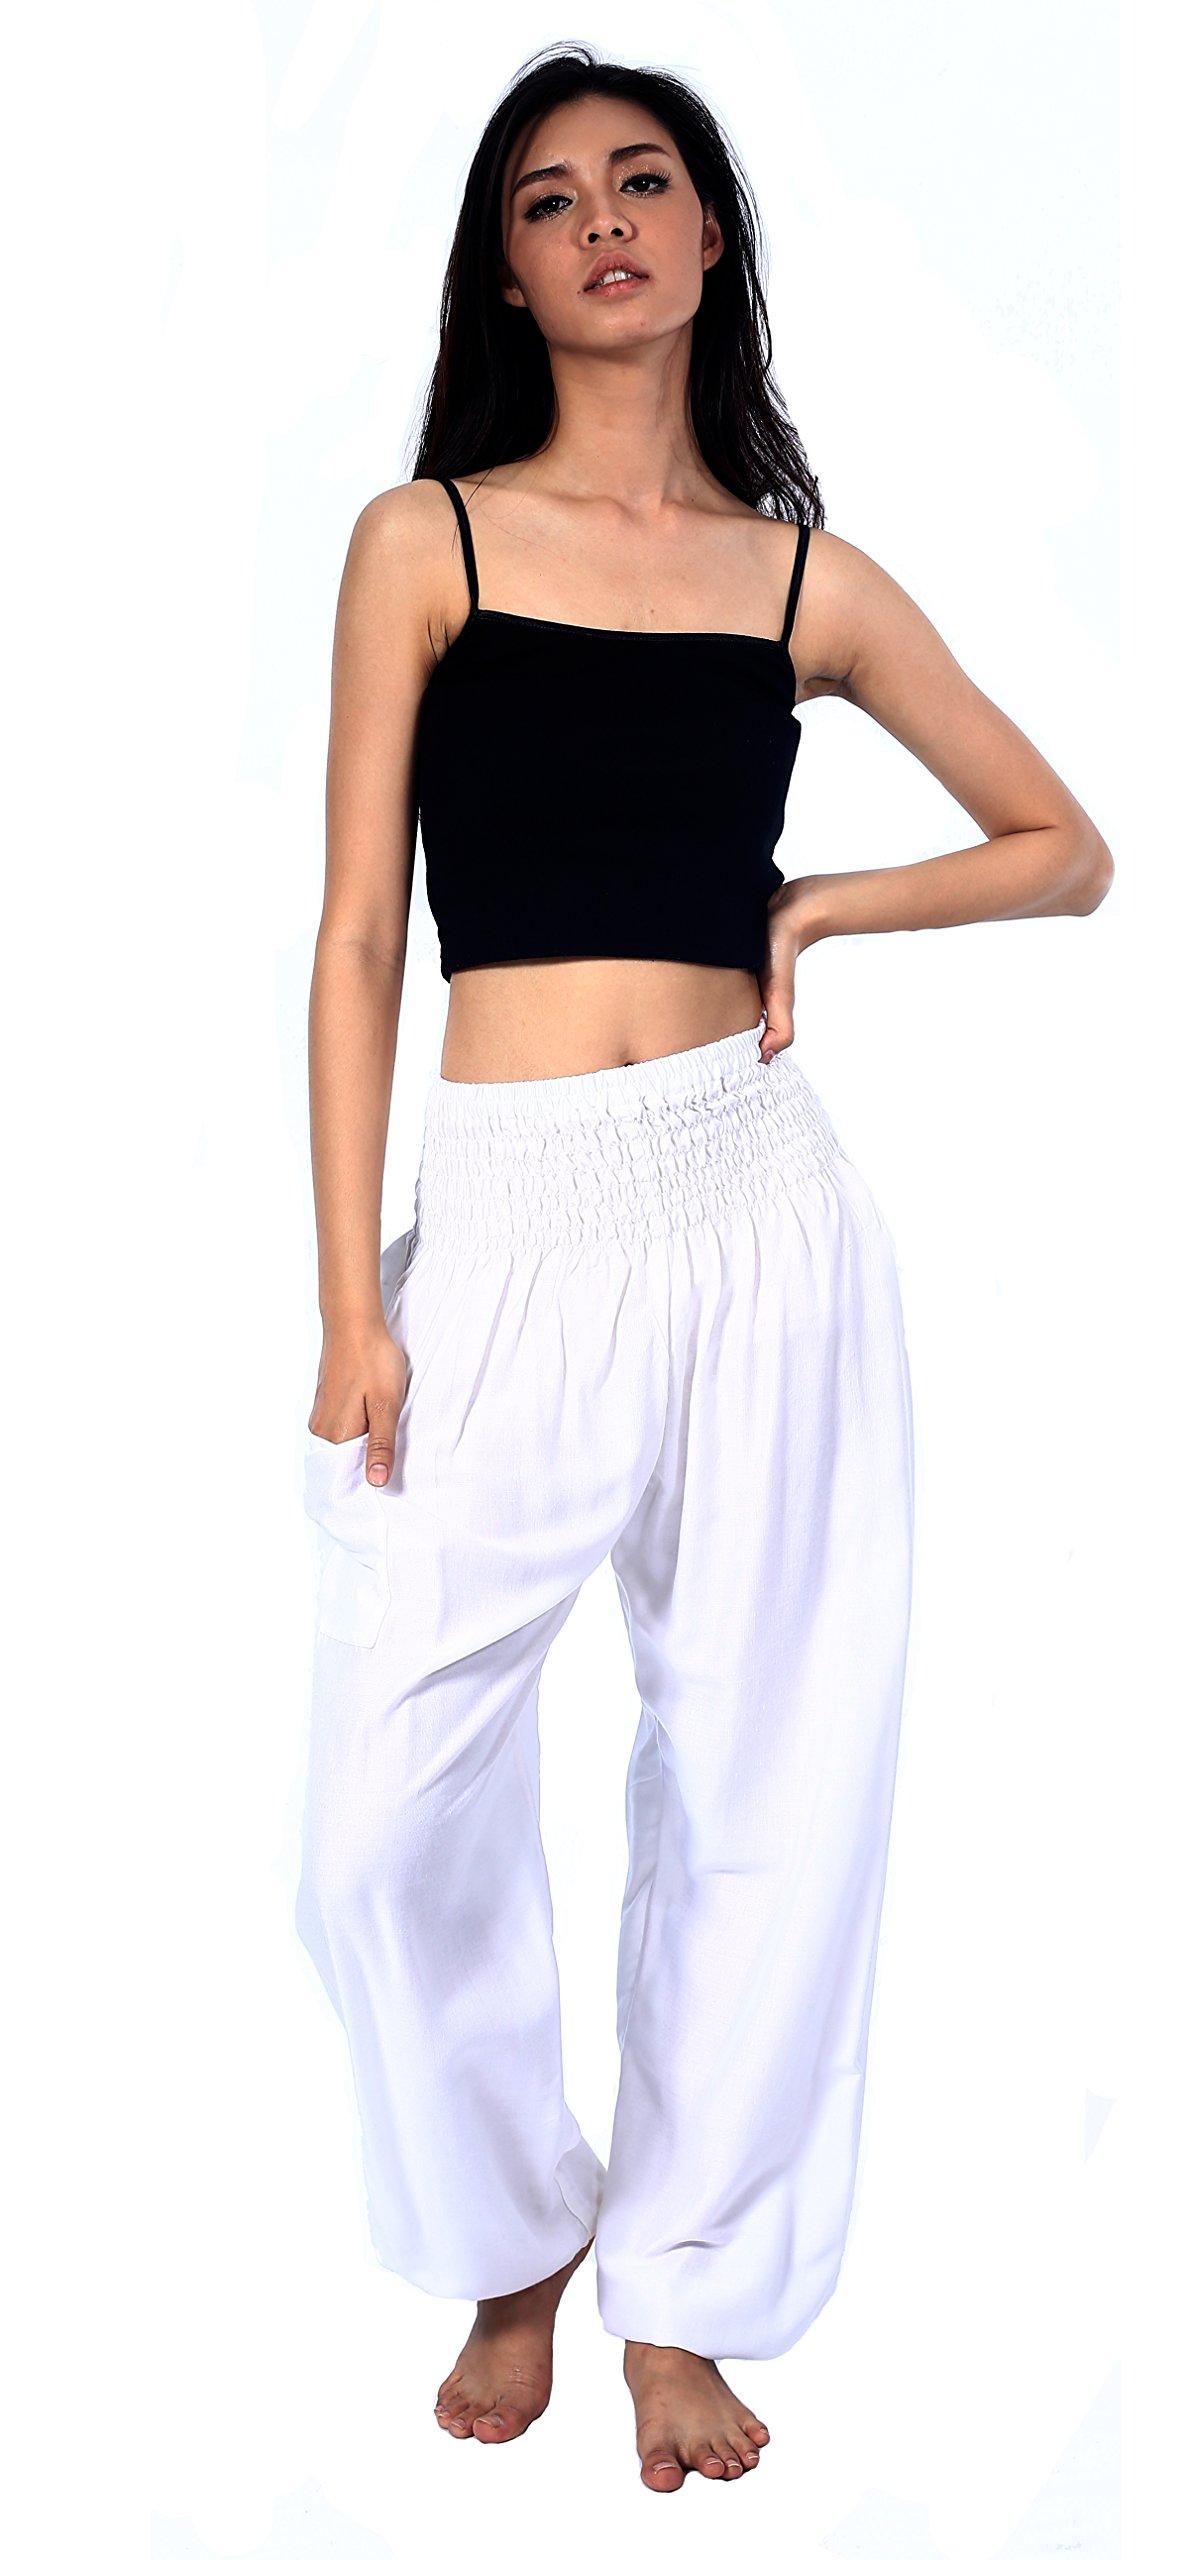 Boho Vib Women's Rayon Print Smocked Waist Boho Harem Yoga Pants (Small/Medium, Solid White) by Boho Vib (Image #2)